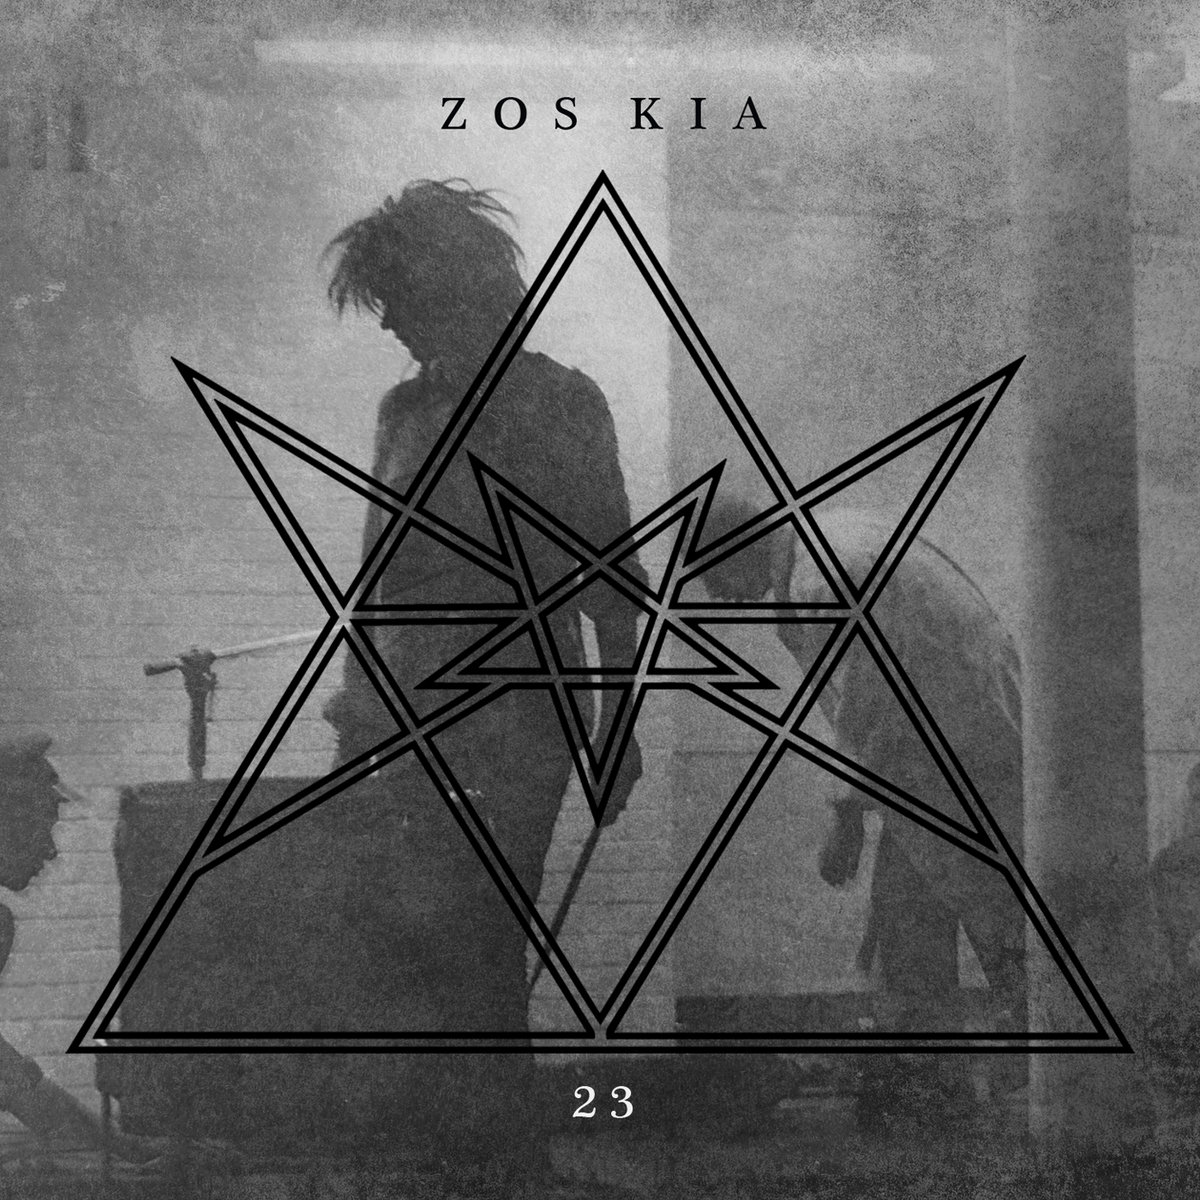 Zos Kia (pre COIL) - 23 | INFINITE FOG PRODUCTIONS